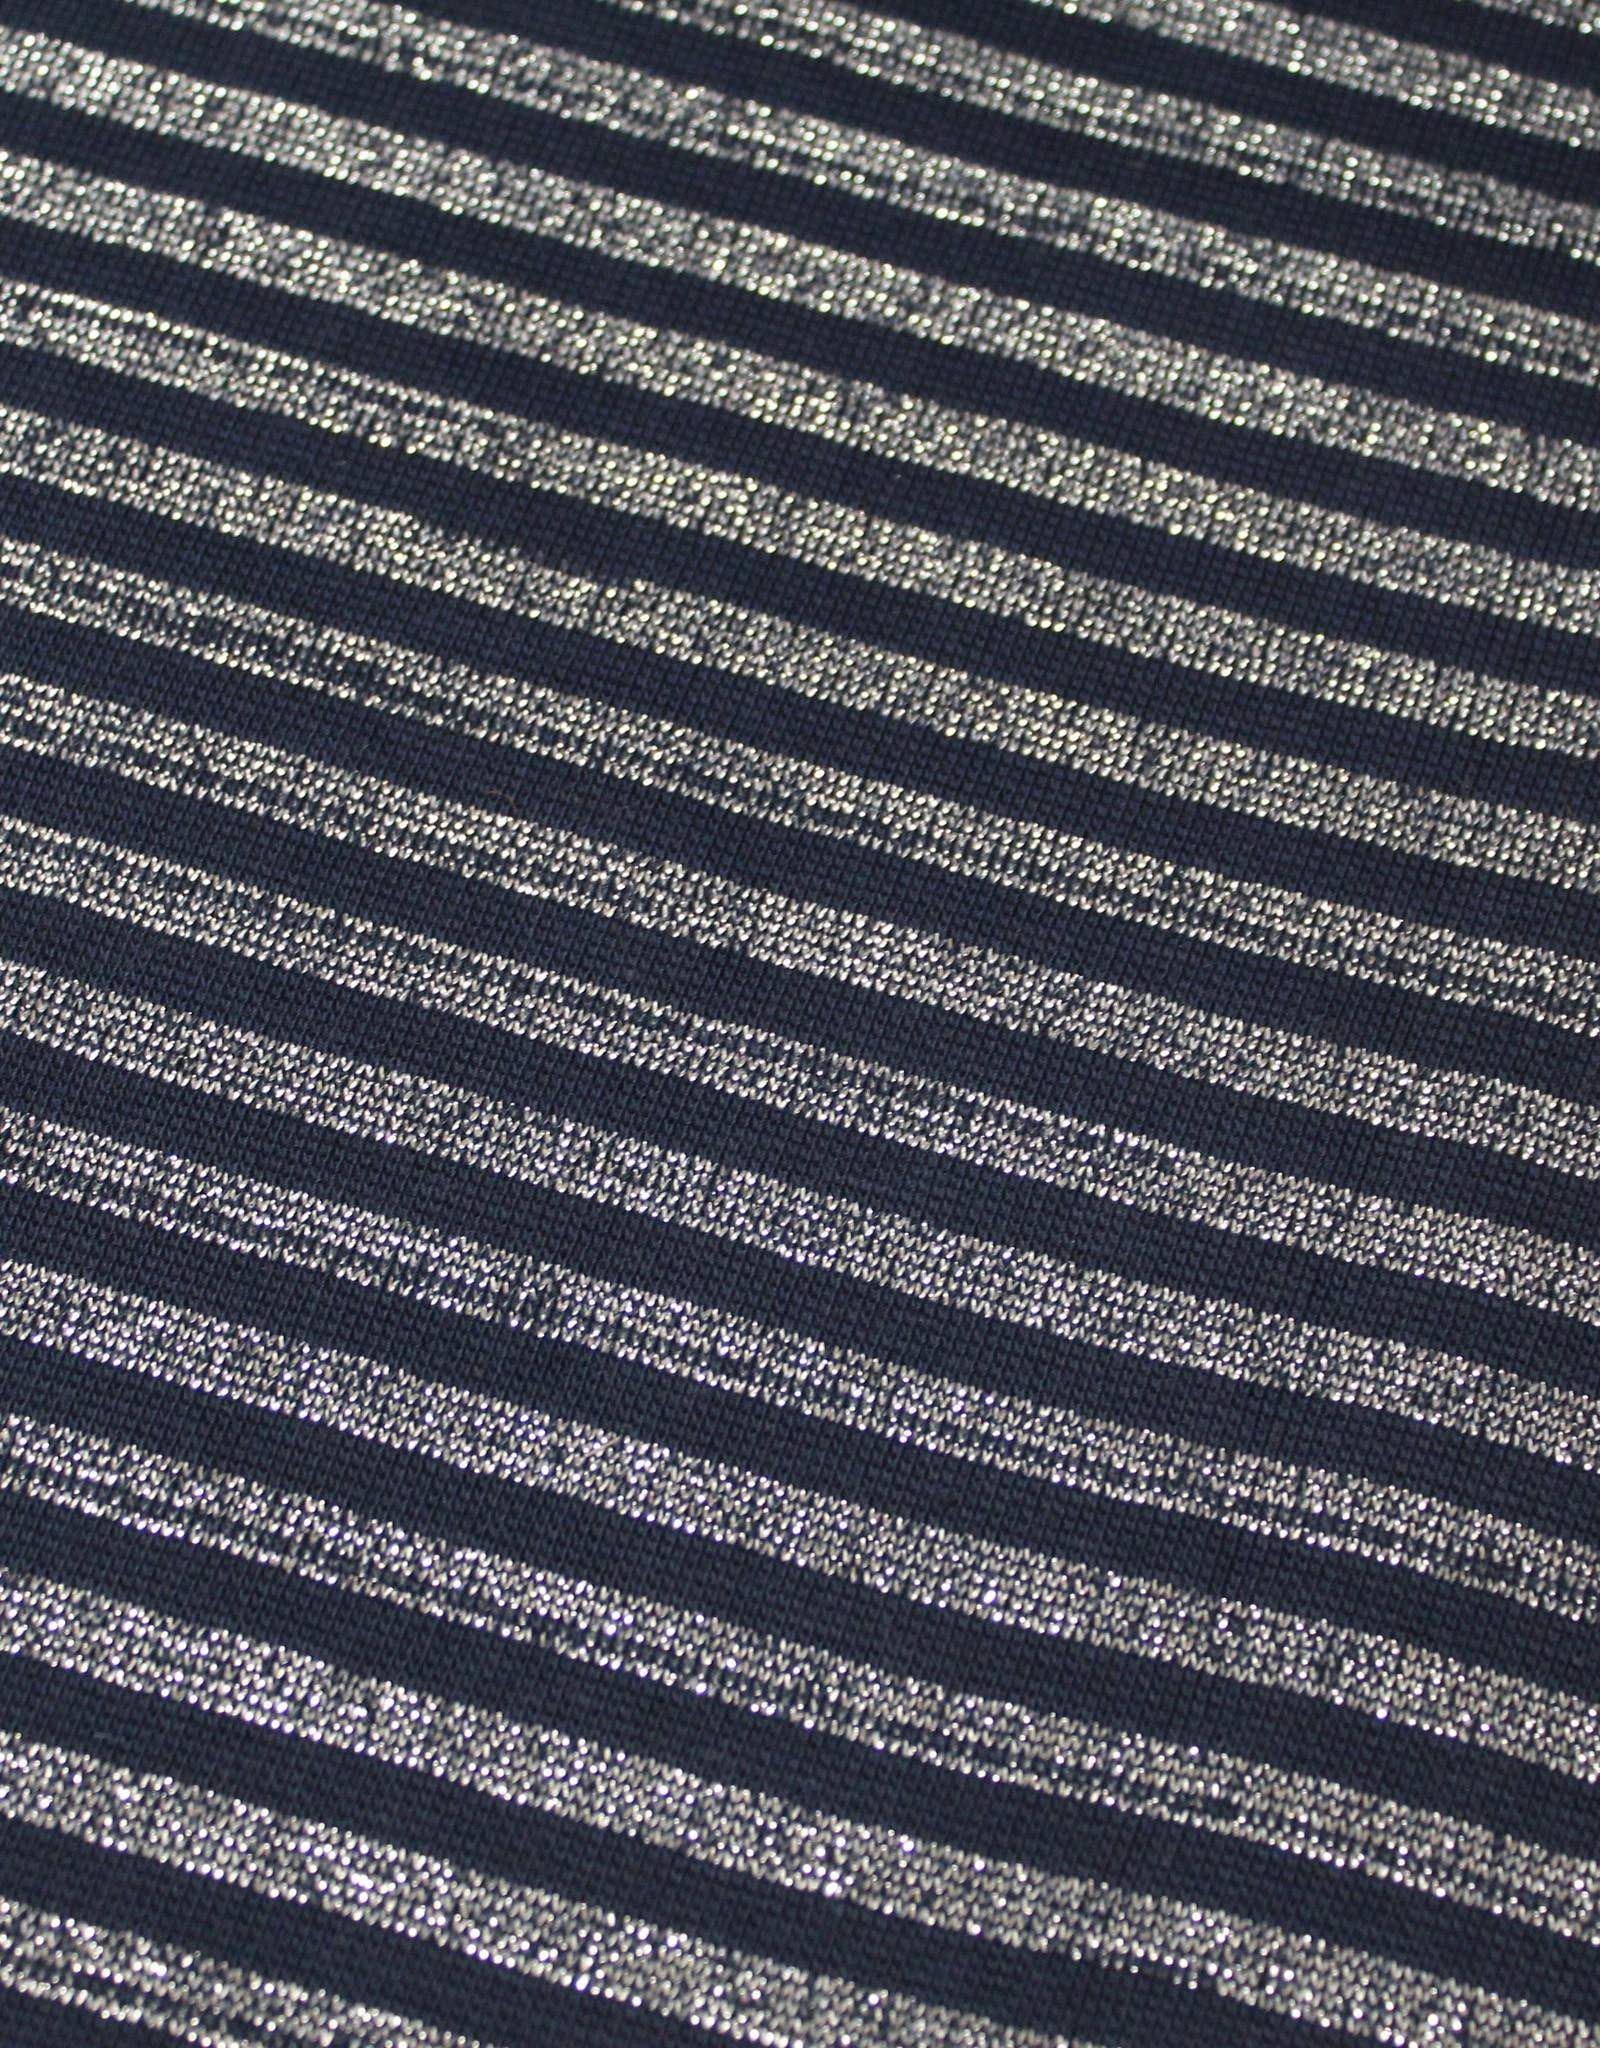 ALB Stoffe Boordstof glam navy zilver gestreept 35cm tubular